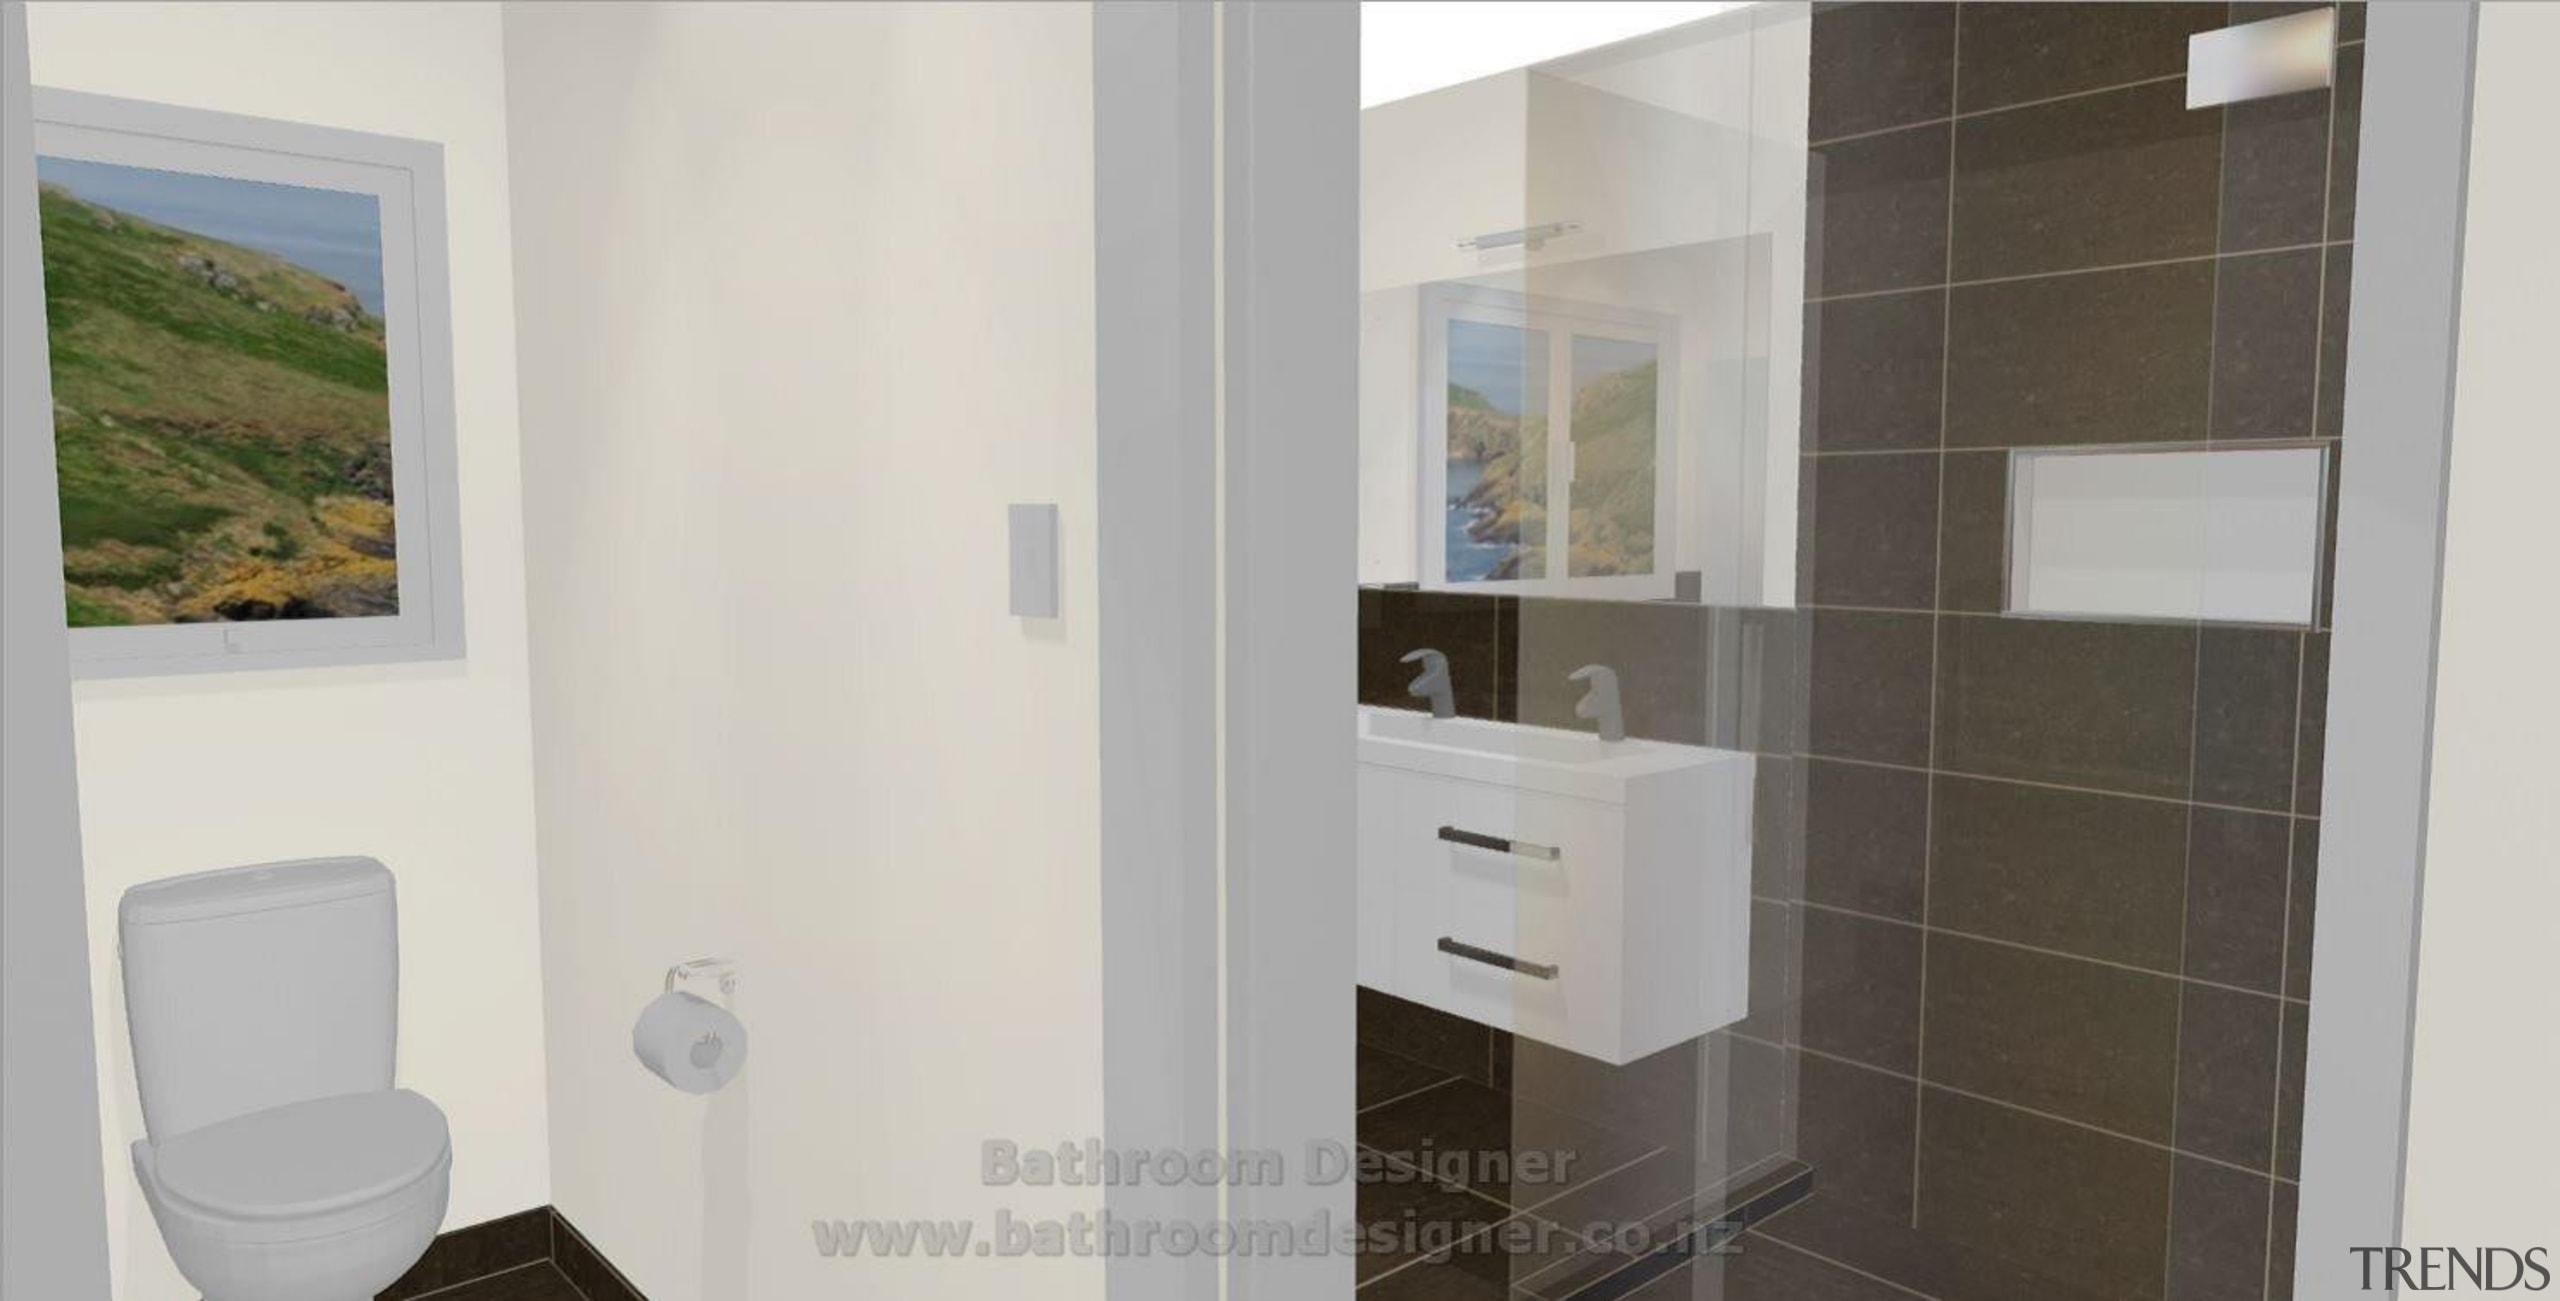 Bathroom Designer showing partially tiled walls in bathroom bathroom, bathroom accessory, bathroom cabinet, interior design, property, room, gray